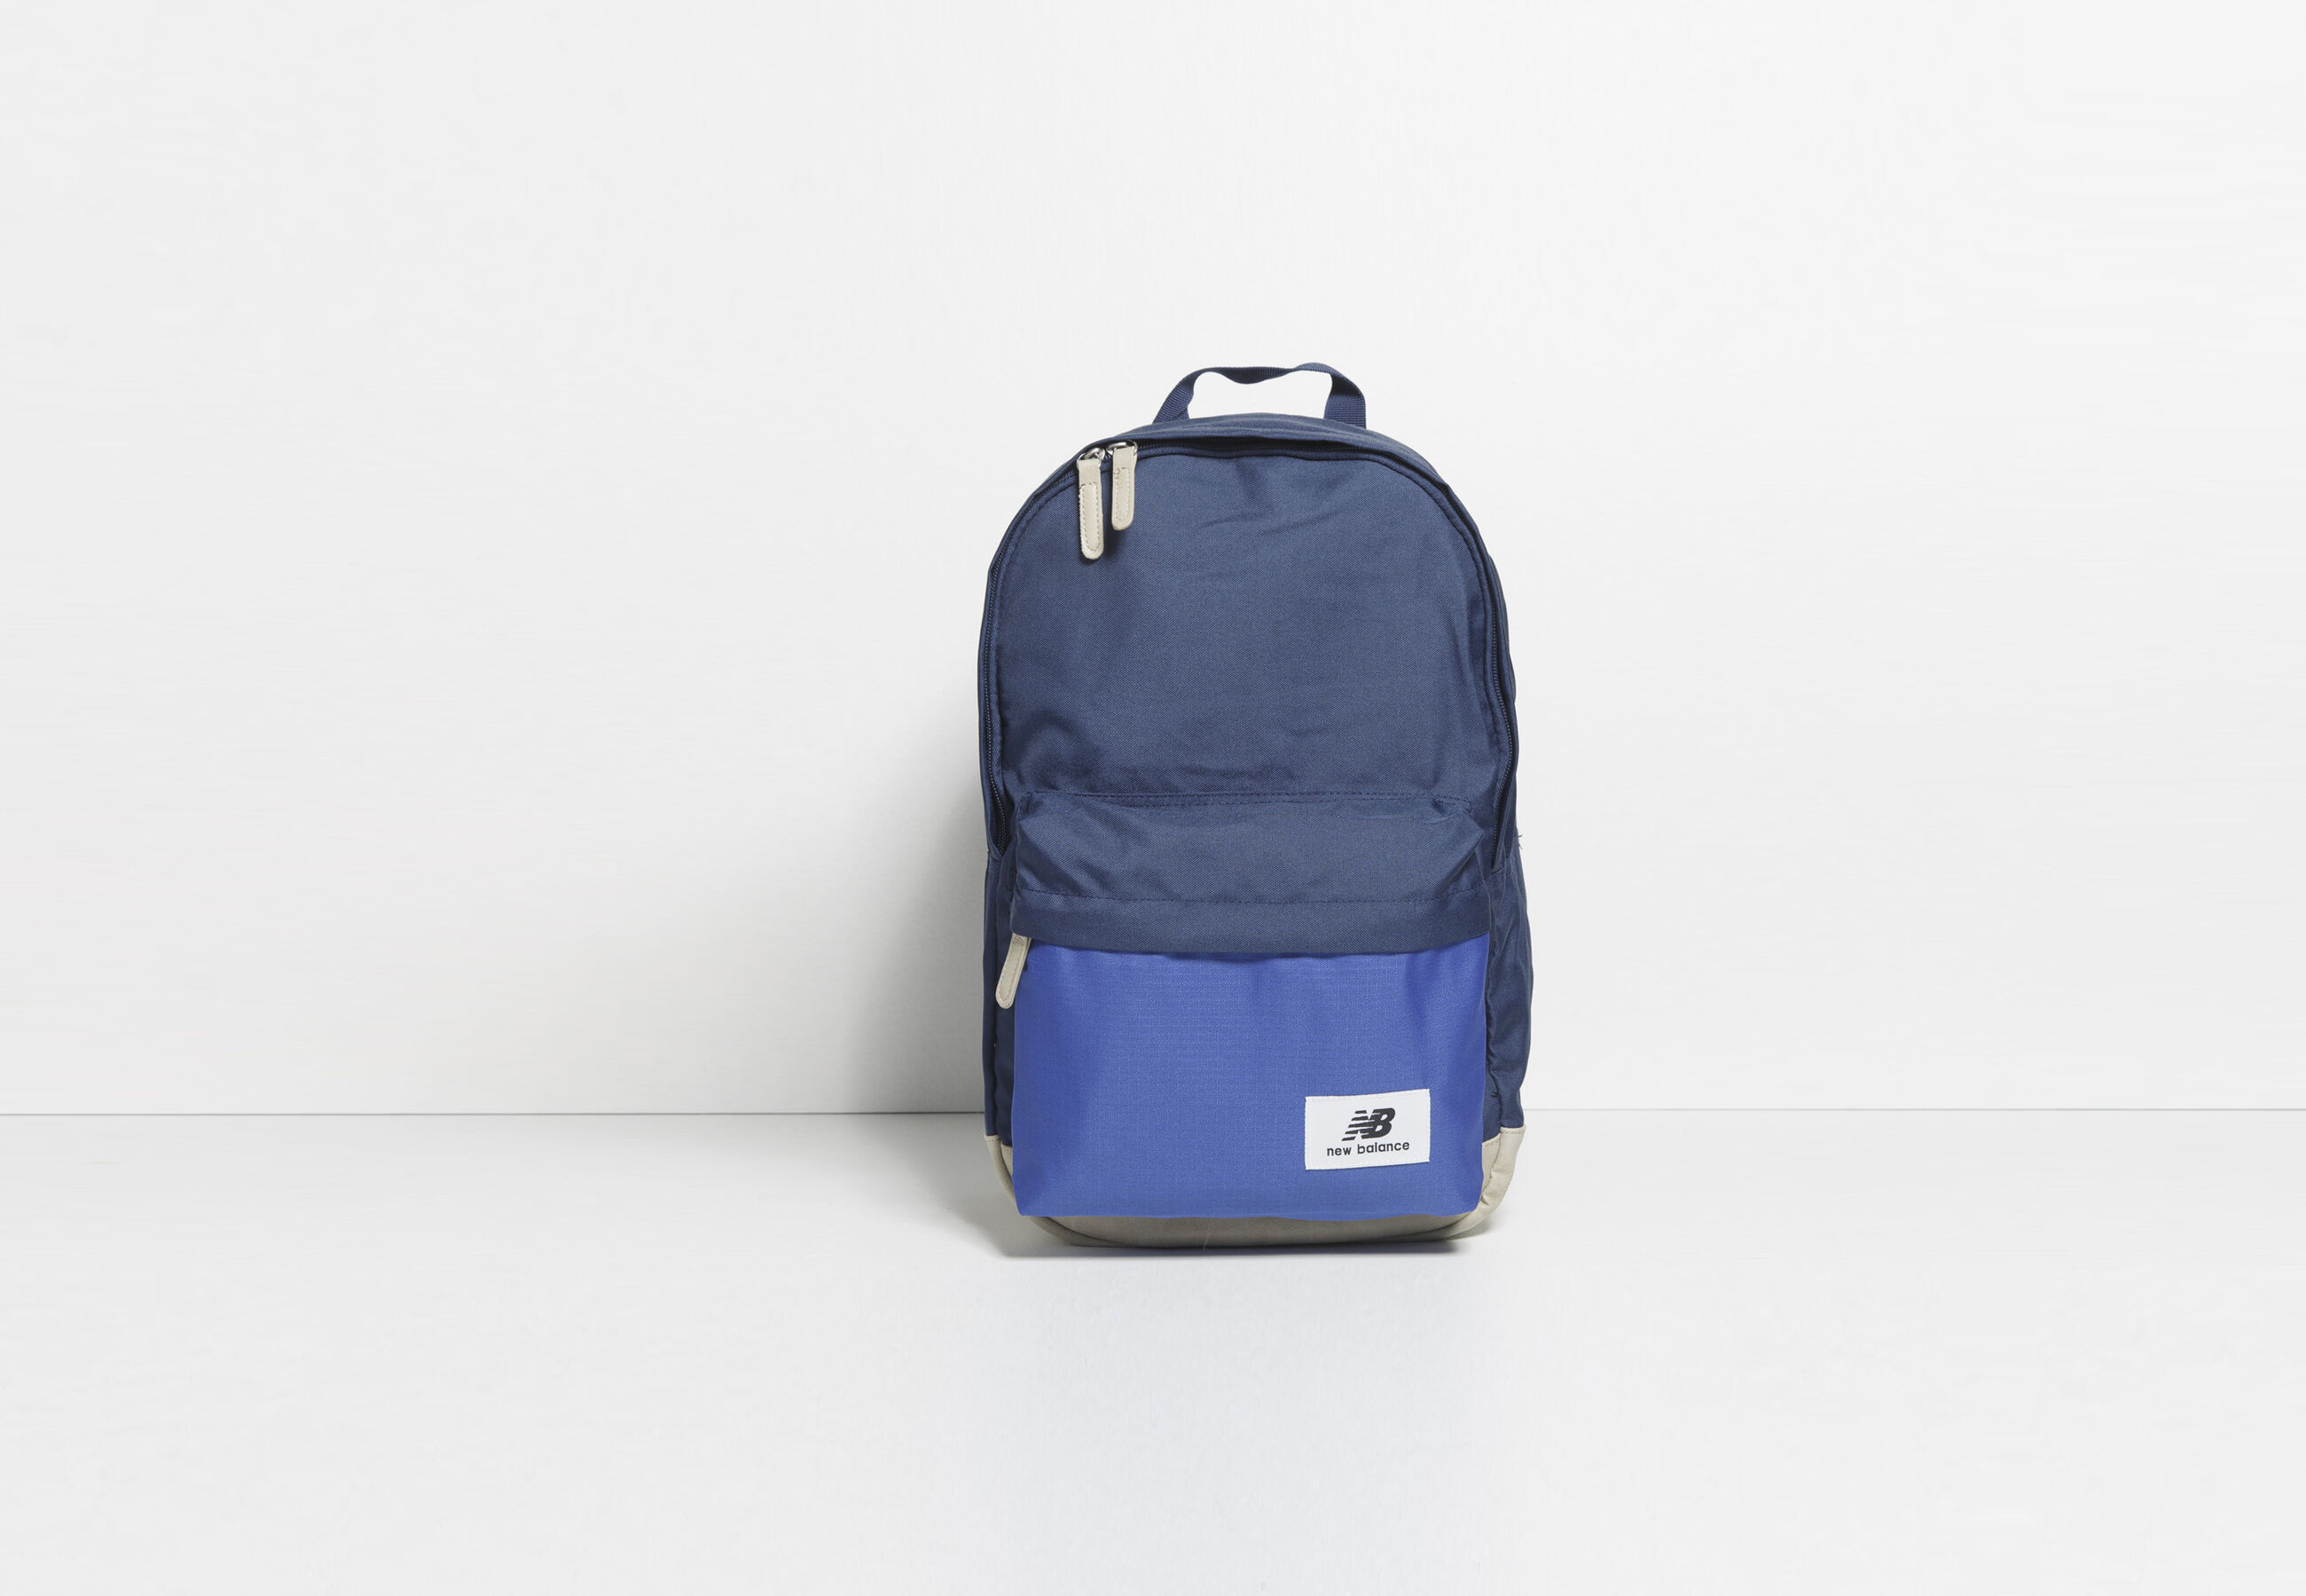 sac dos classique new balance bleu fantaisie homme jules. Black Bedroom Furniture Sets. Home Design Ideas